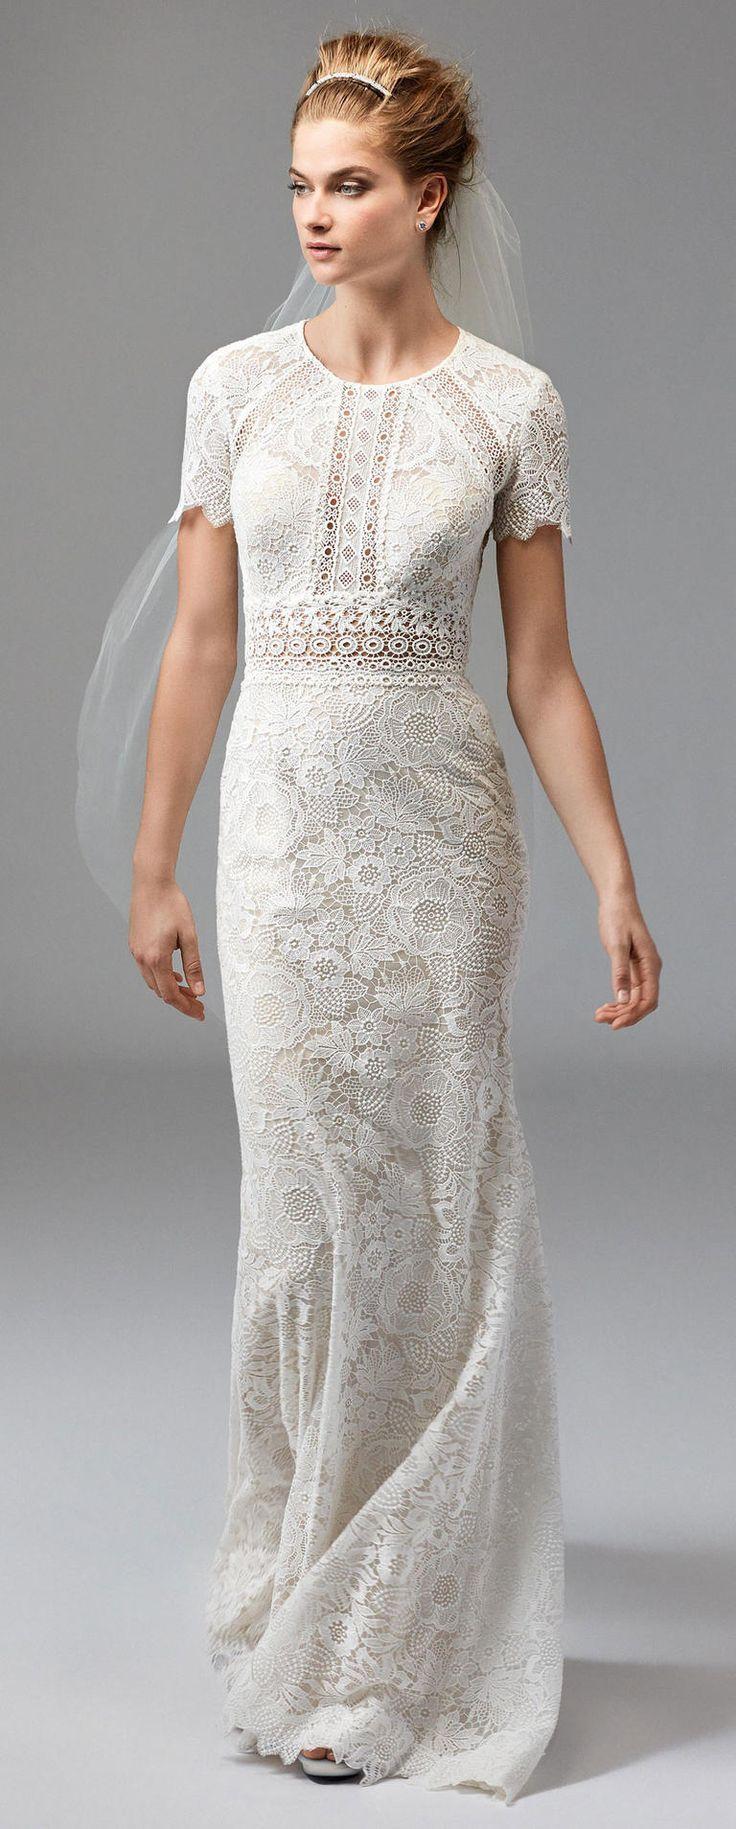 Short wedding dresses for older brides  Beautiful Boho Dresses From Bridal Fashion Week  TheKnot